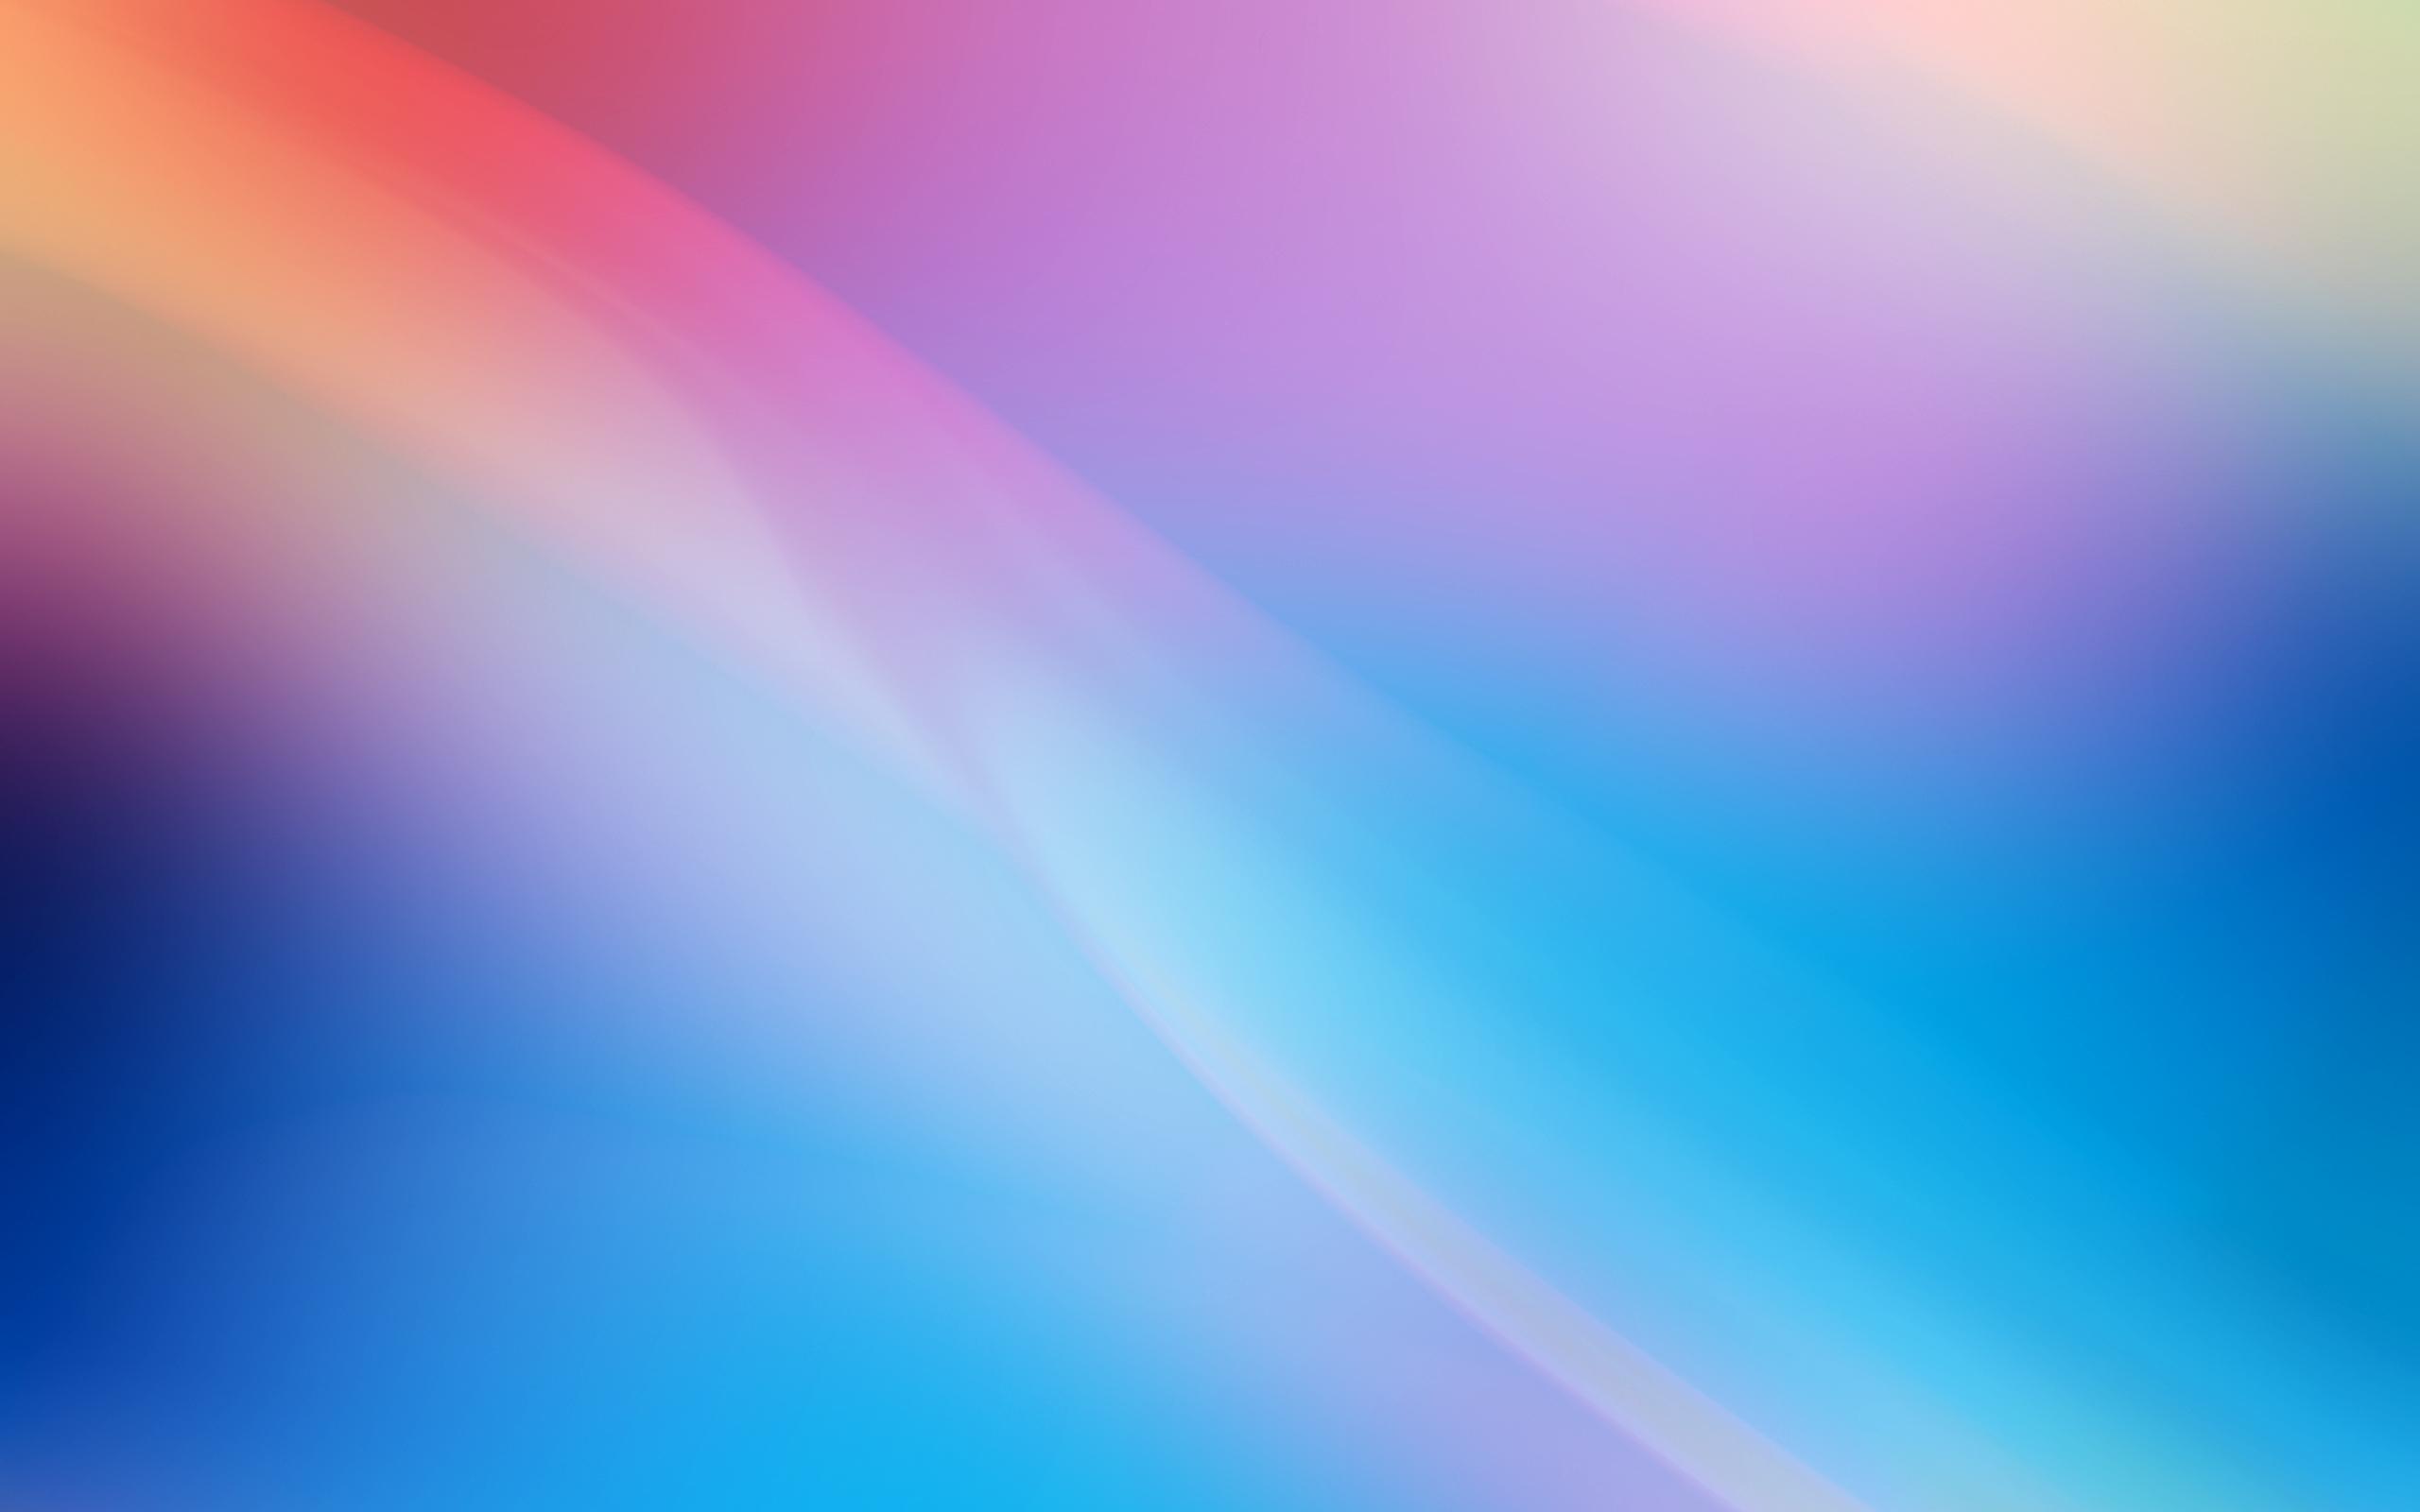 2560x1600px light colored wallpaper - wallpapersafari